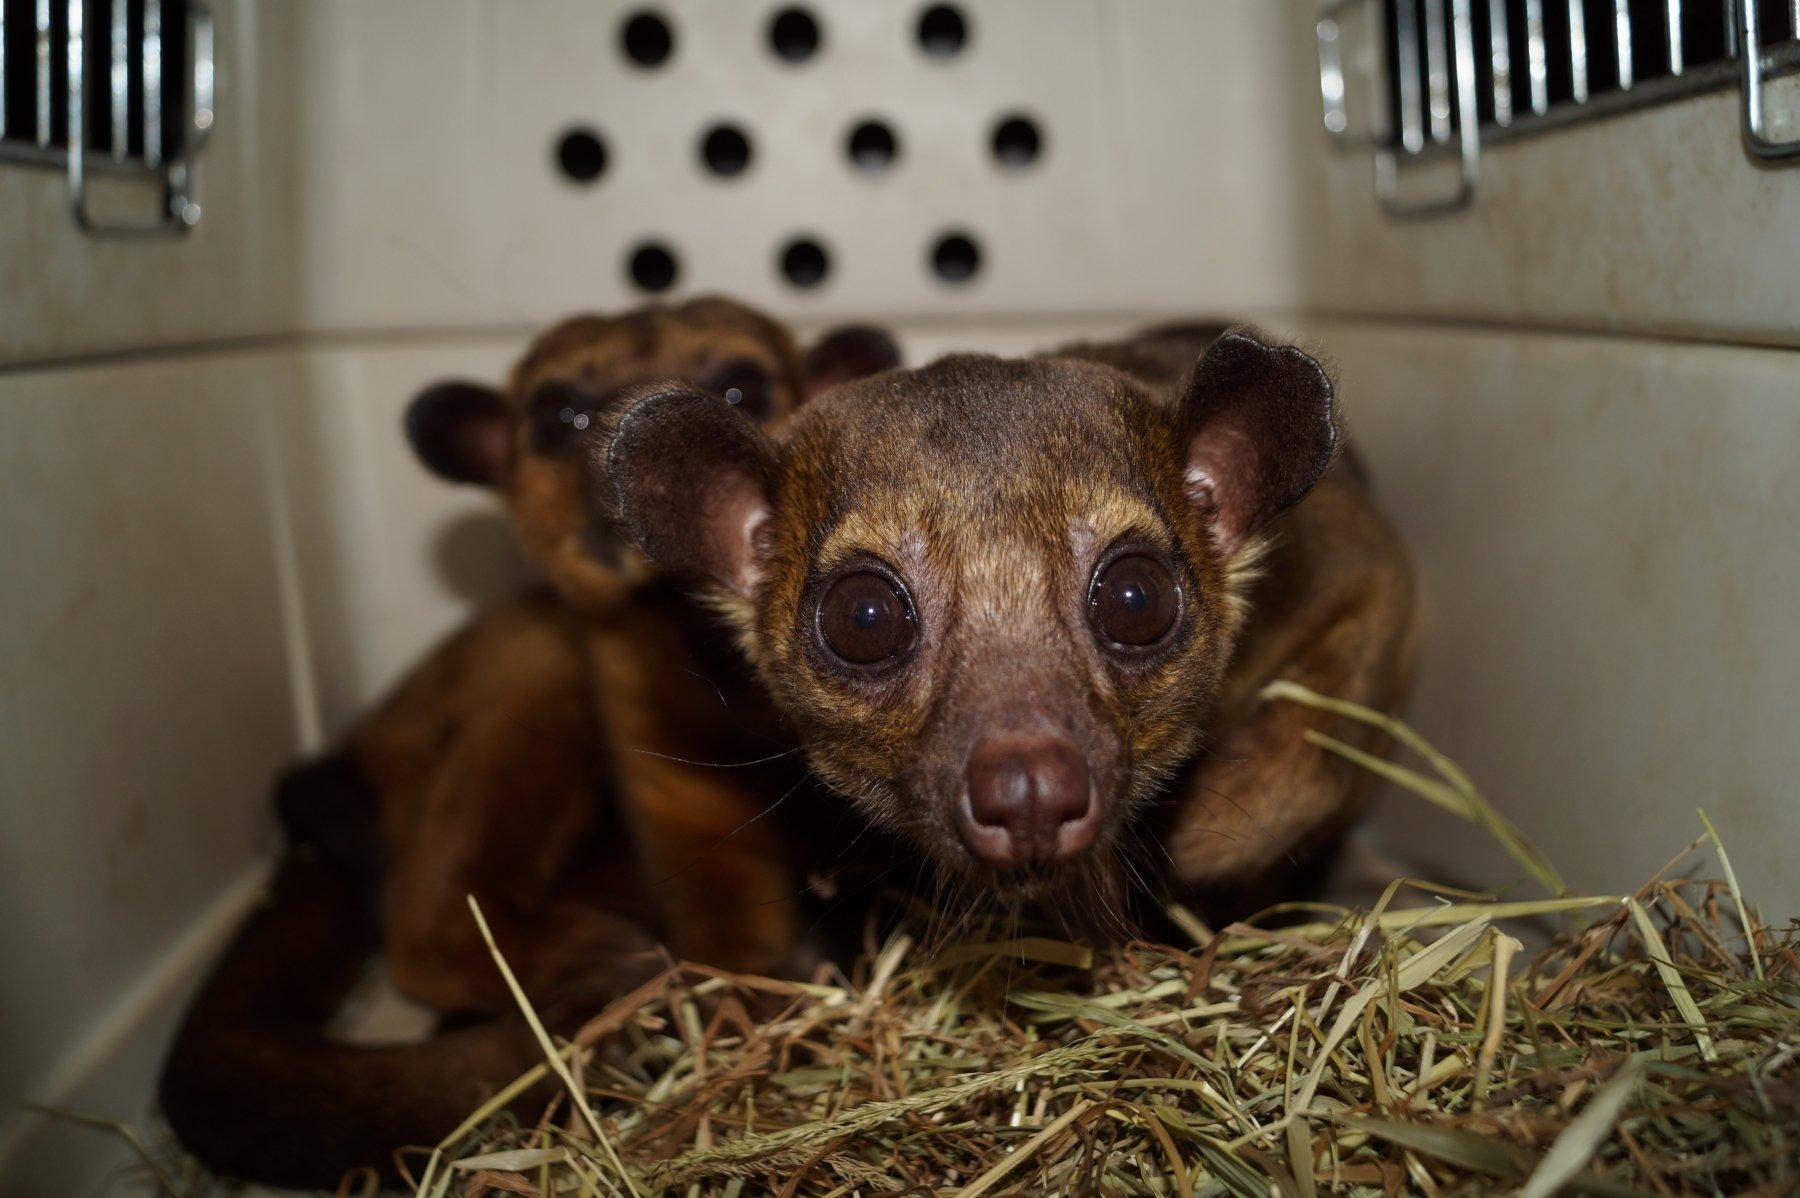 Foto: Zoo Dortmund